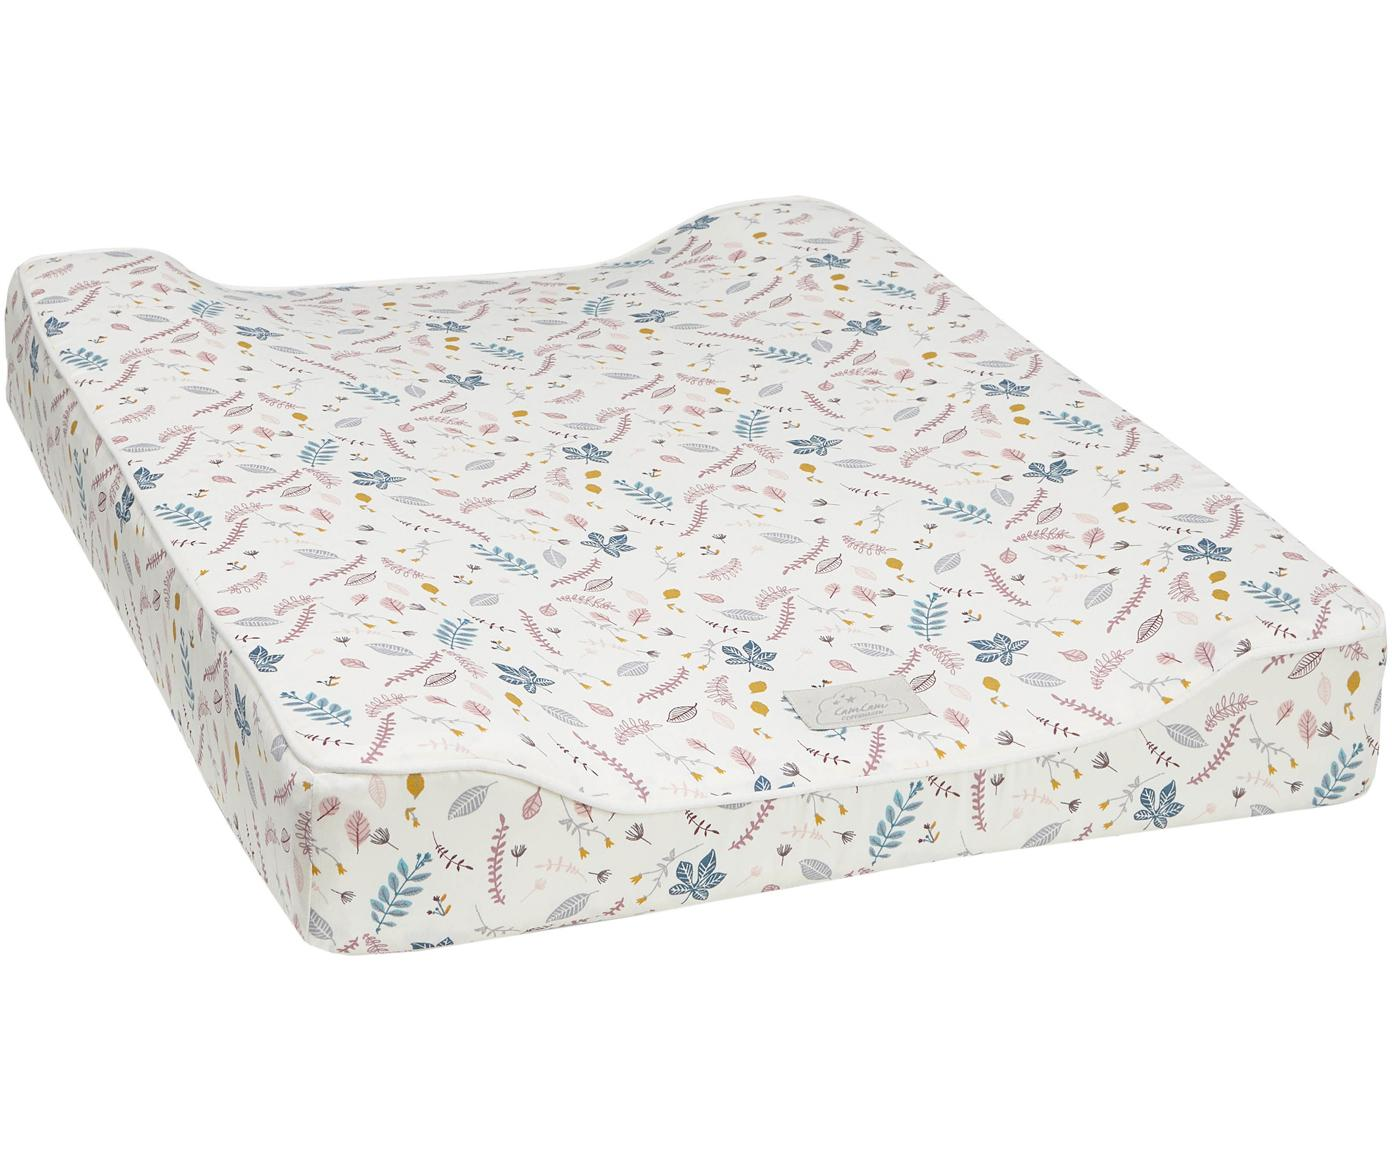 Colchón cambiador Pressed Leaves, Tapizado: algodón ecológico, certif, Crema, rosa, azul, gris, amarillo, An 50 x L 65 cm